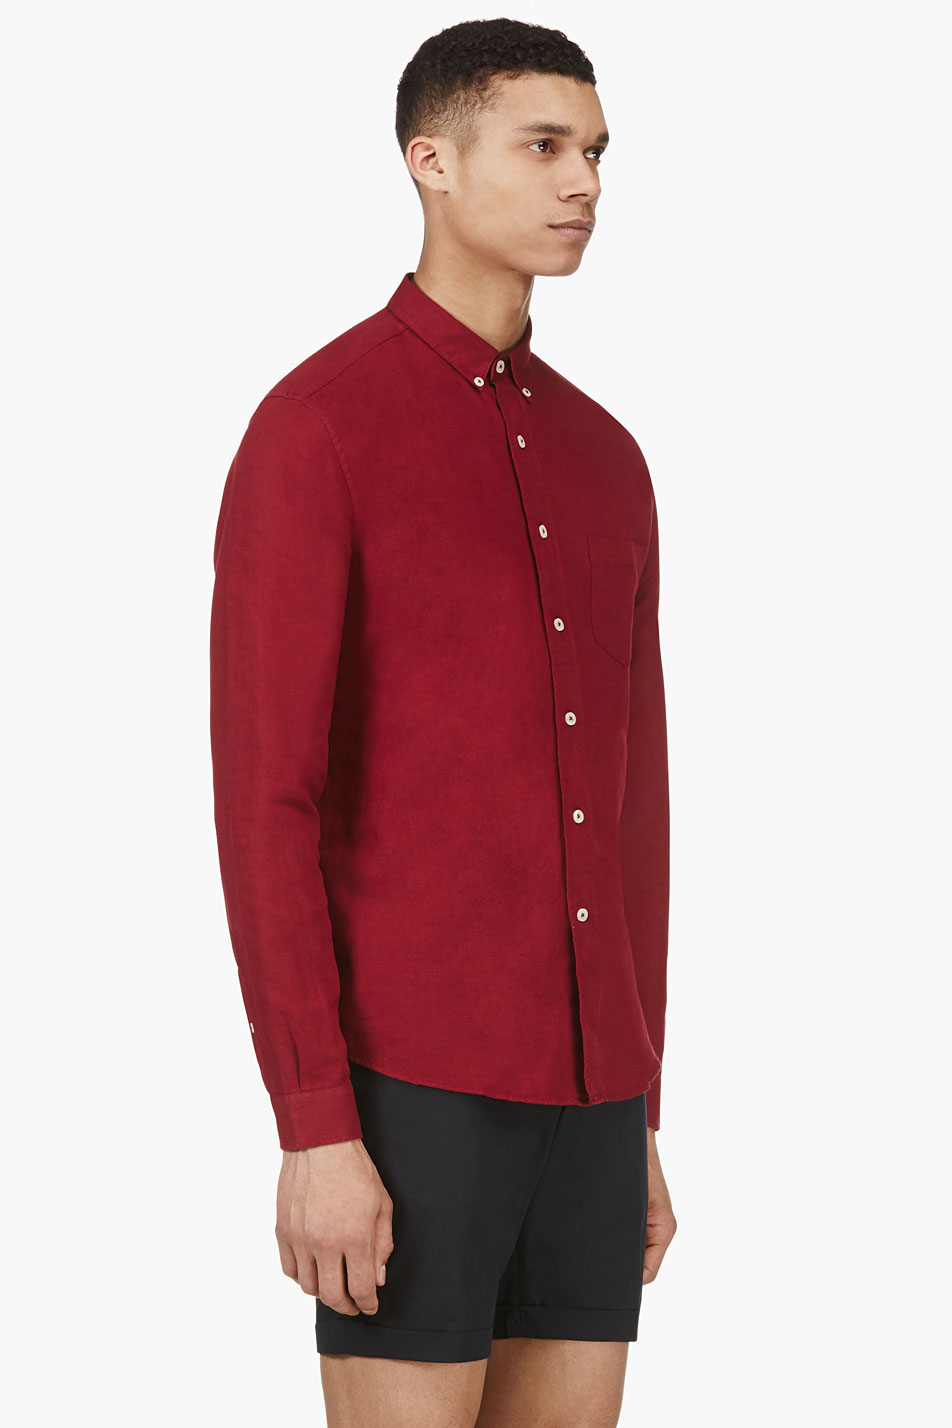 lyst ami burgundy linen blend button down shirt in red